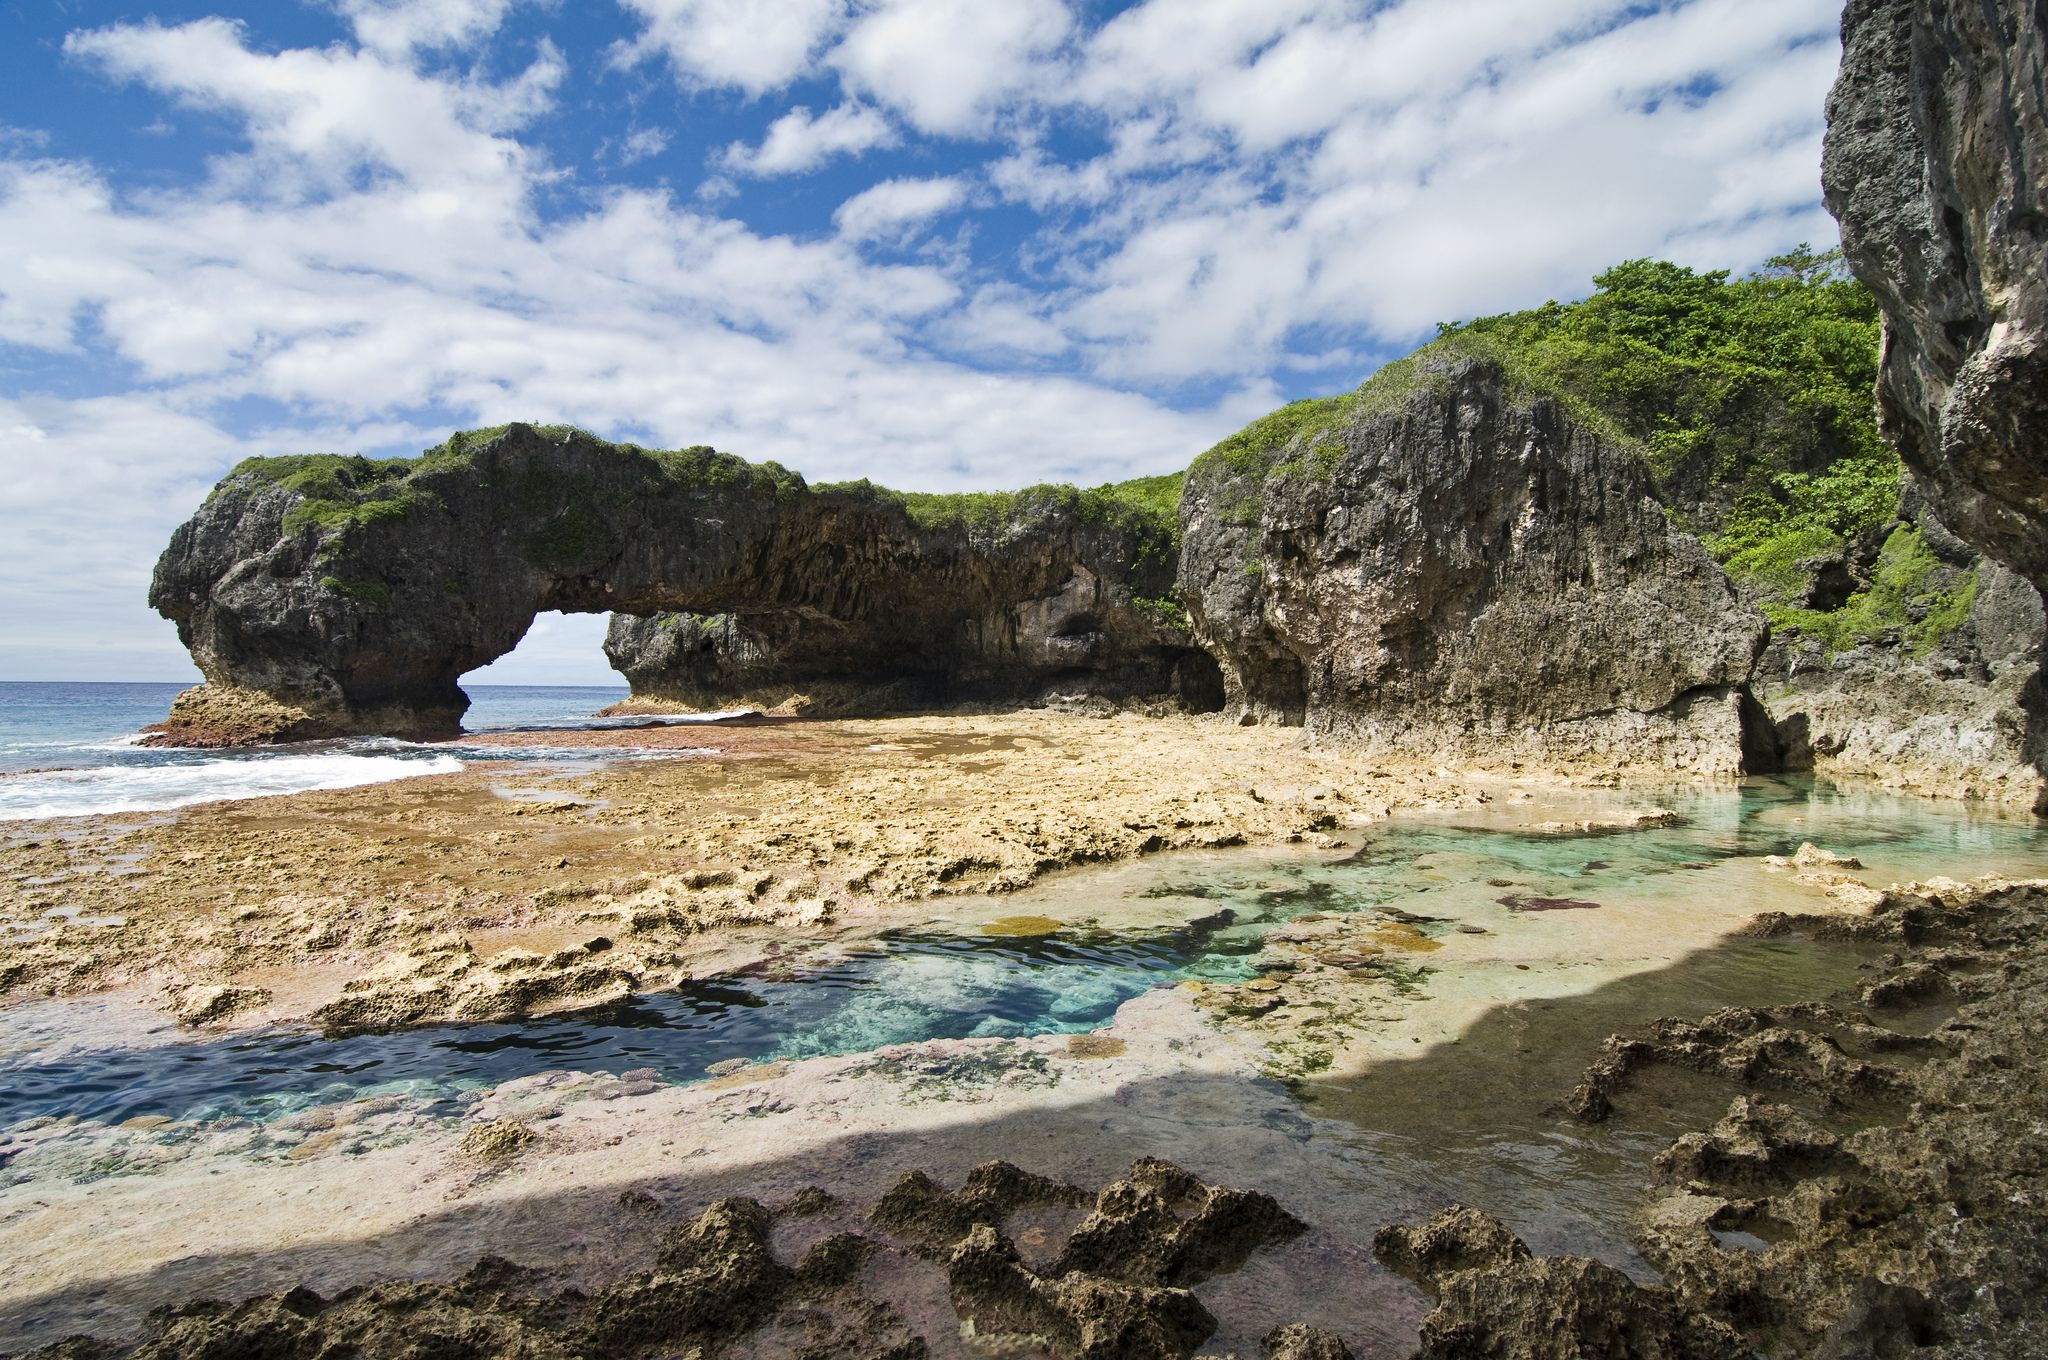 Talava Arches, Niue, French Polynesia ✯ ωнιмѕу ѕαη∂у